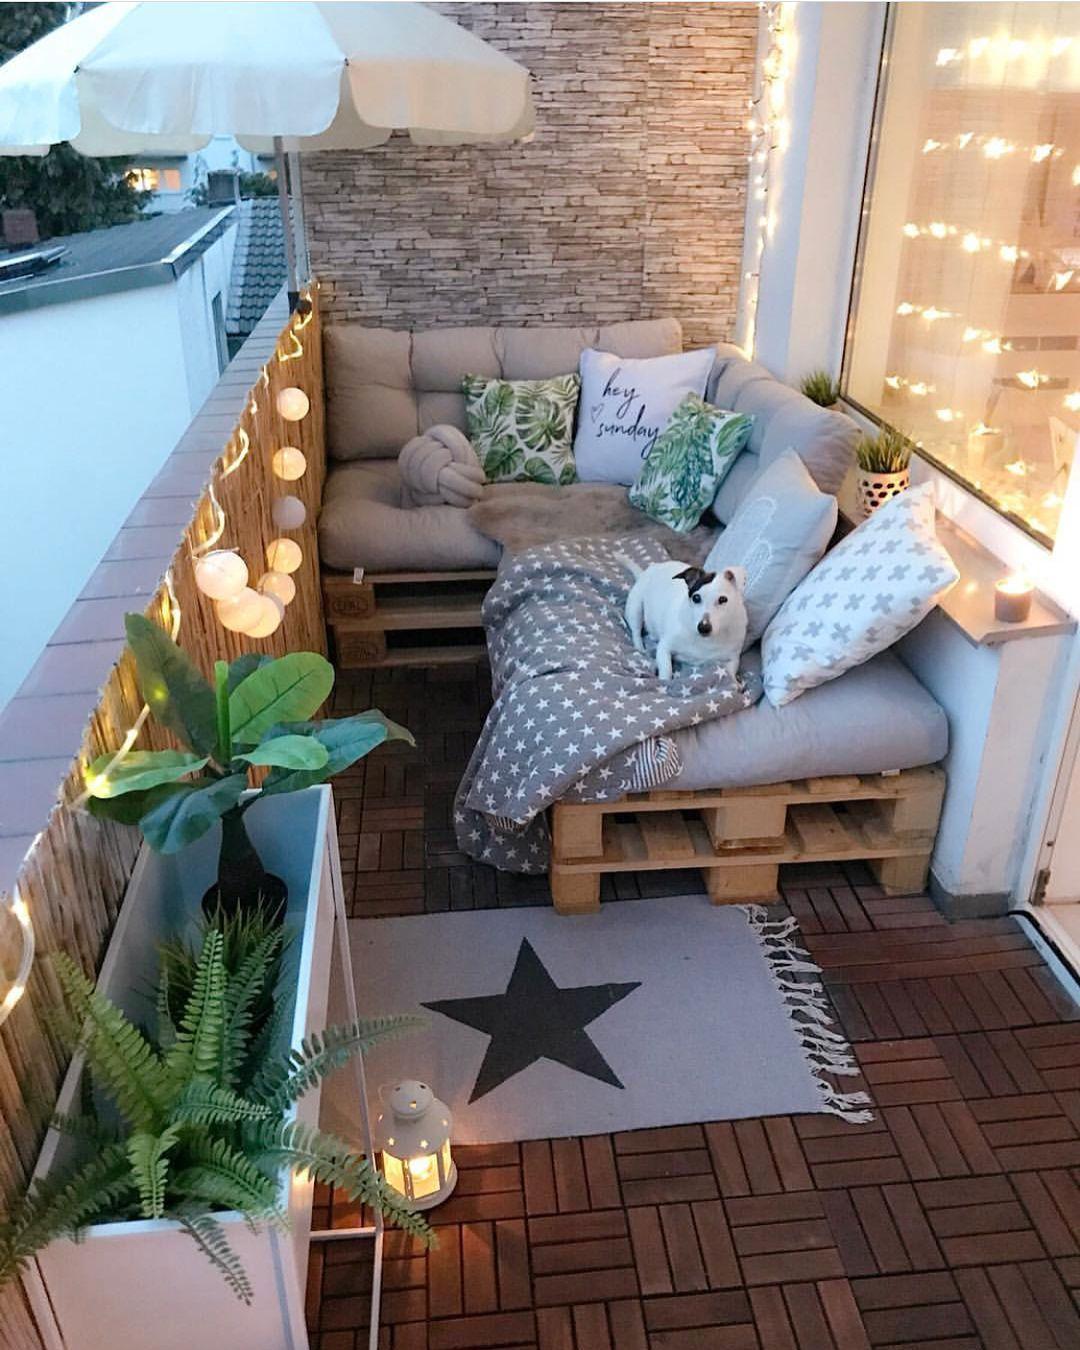 Ideas To Decorate Your Terrace Garden: Home Terrace Garden Inspirations